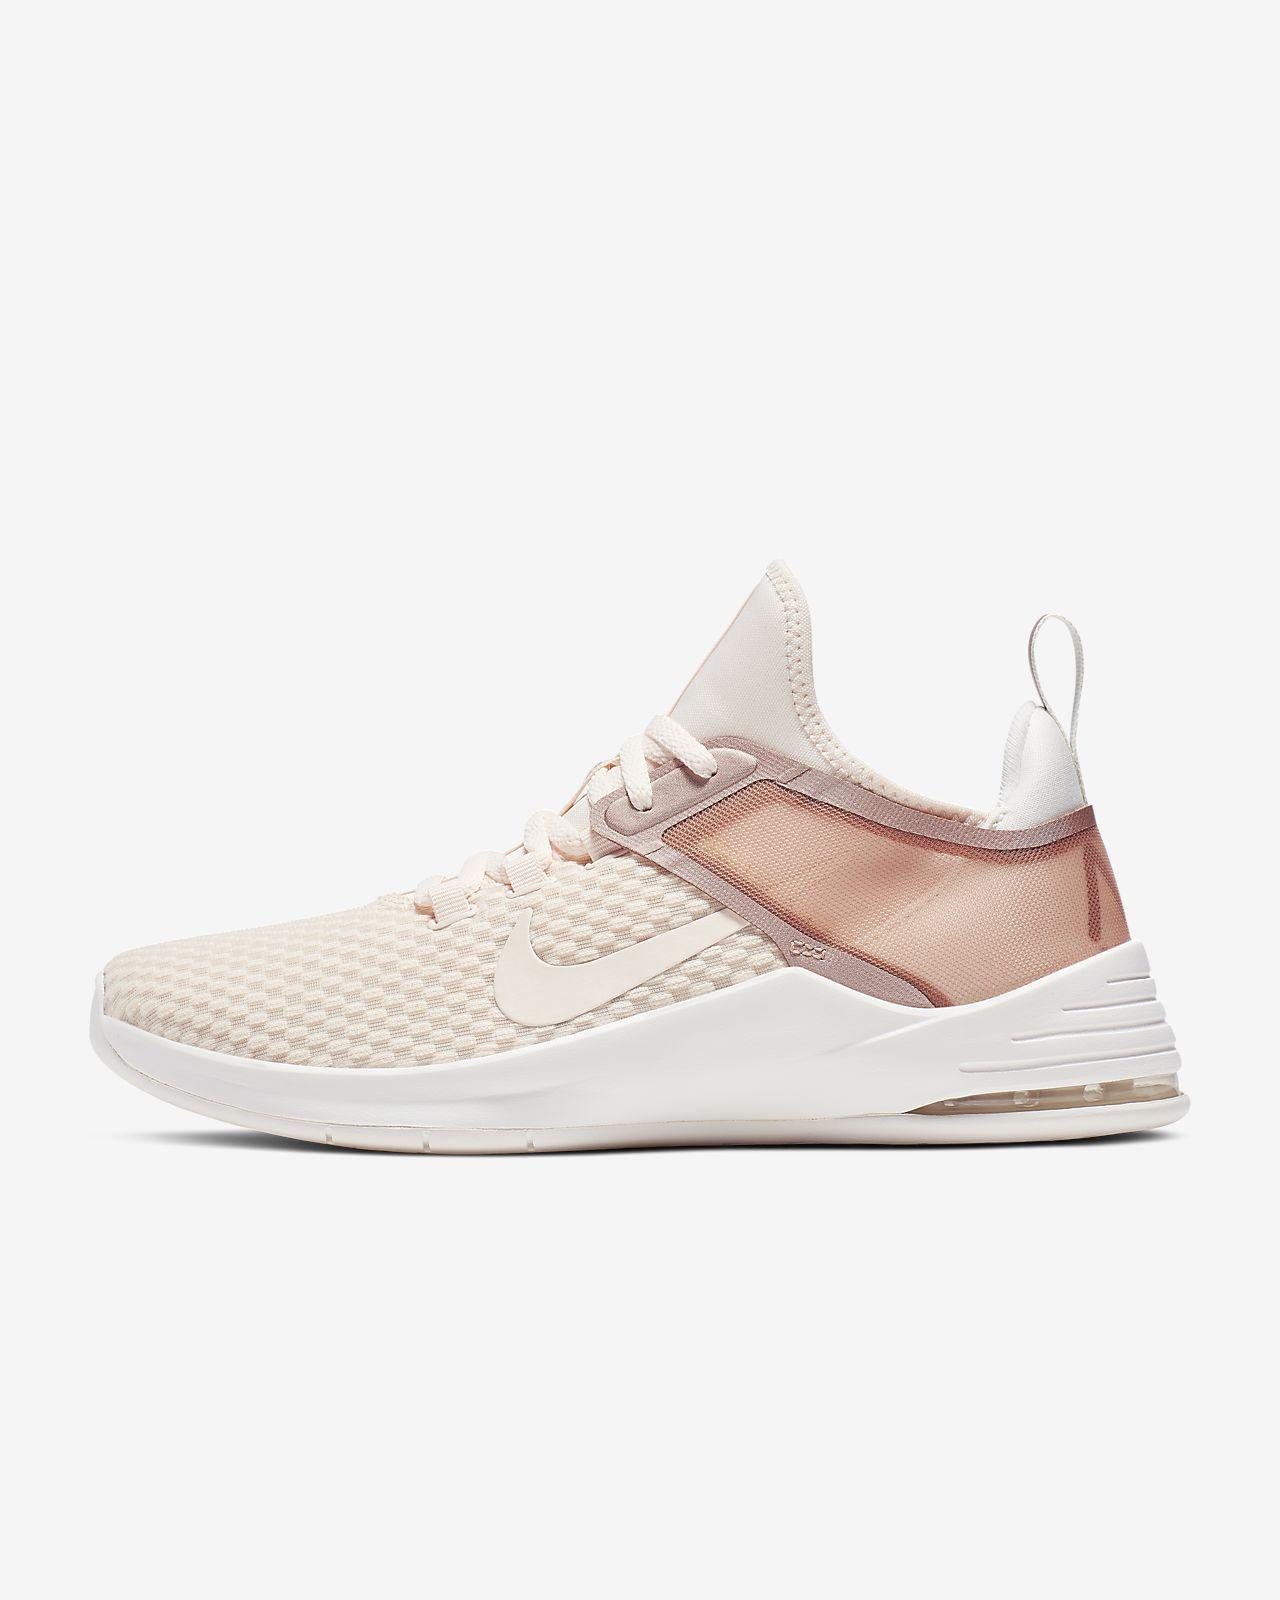 Chaussure de training Nike Air Max Bella TR2 pour Femme